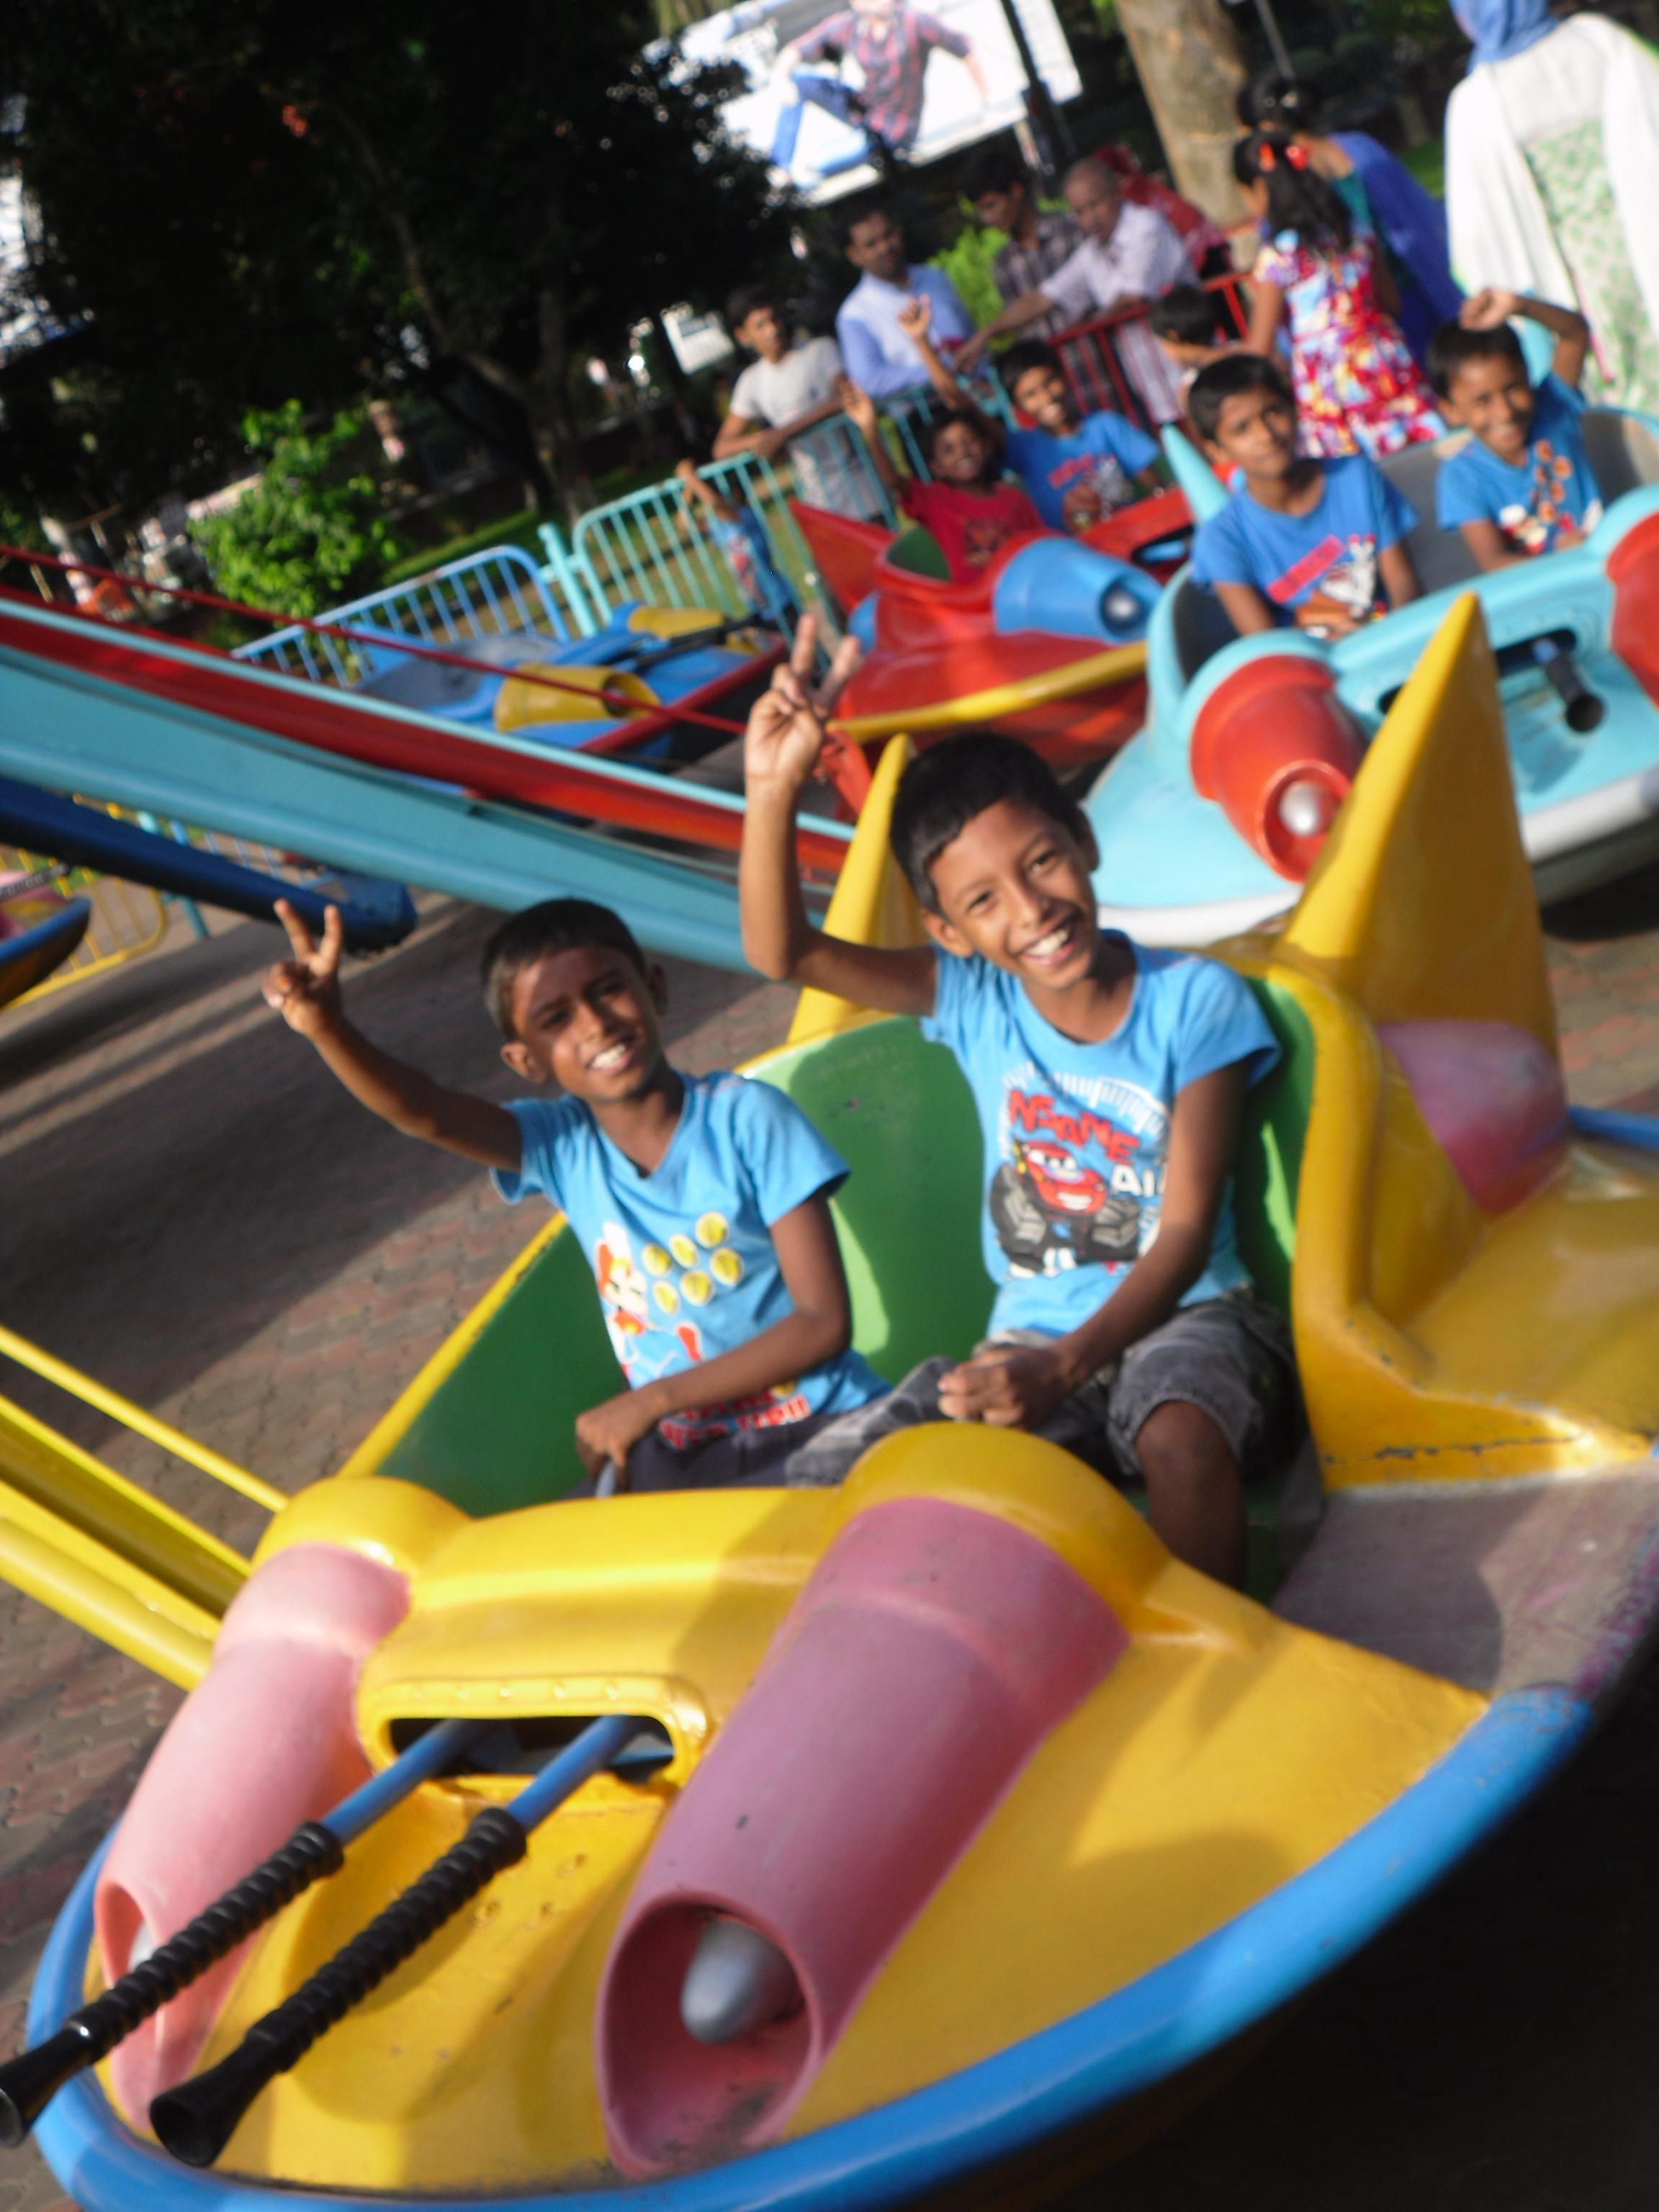 Enjoying the rides at the amusement park